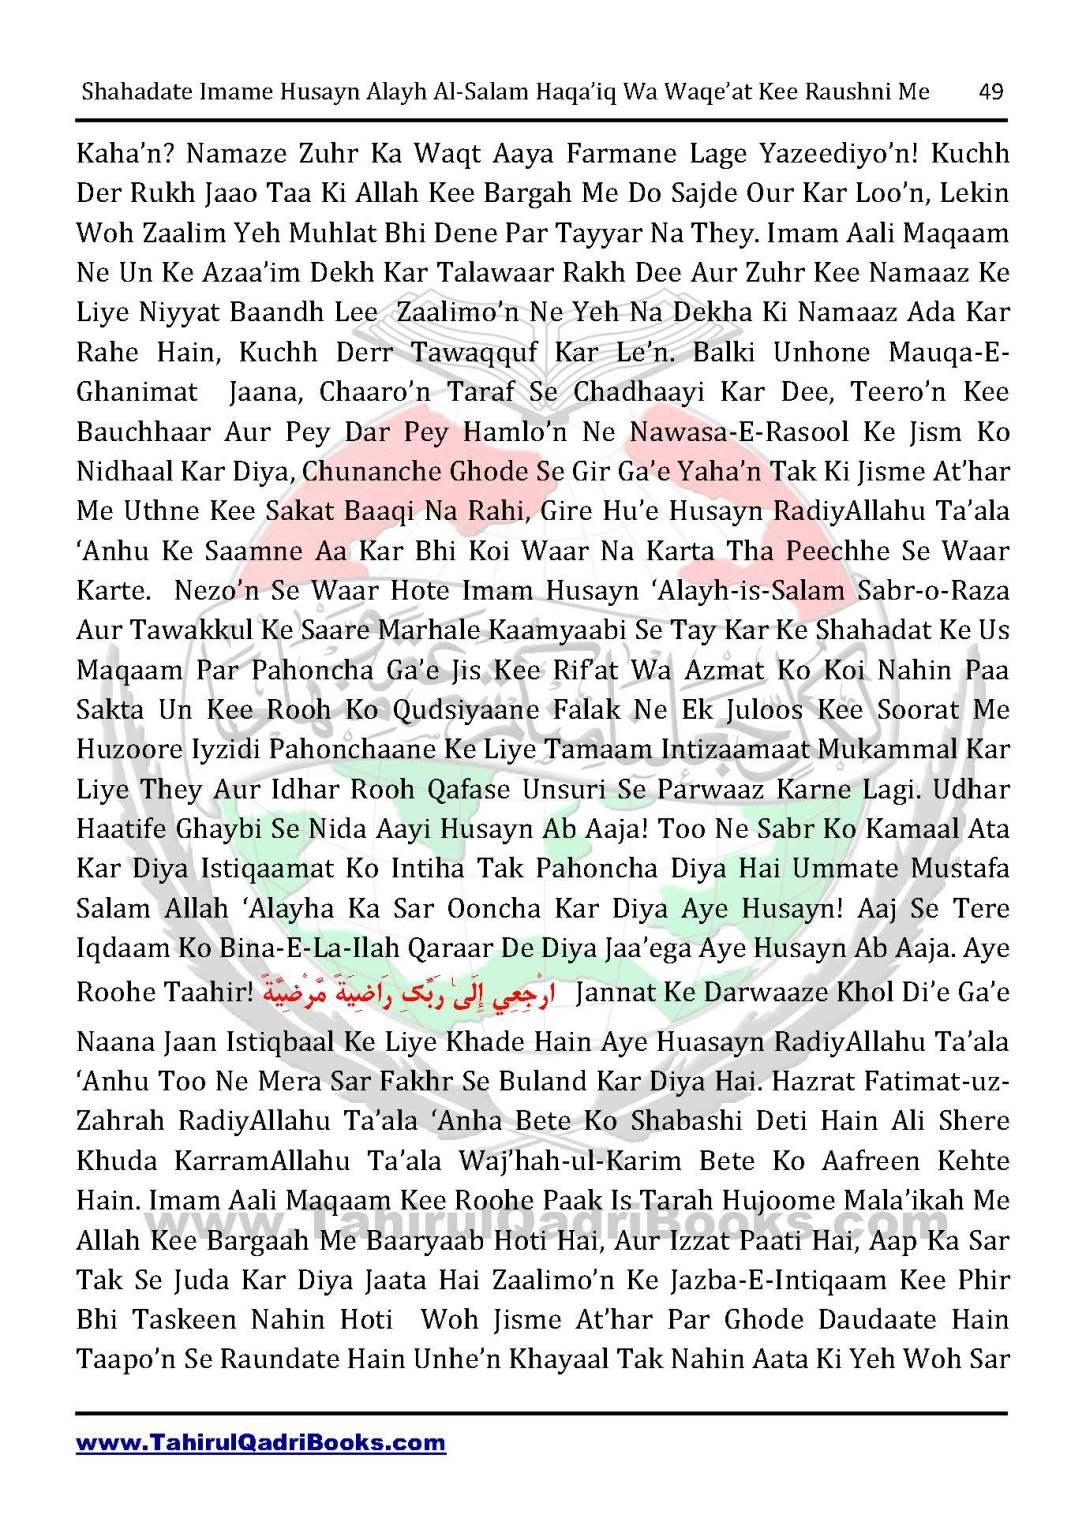 shahadate-imame-husayn-alayh-is-salam-haqaiq-wa-waqe_at-kee-raushni-me-in-roman-urdu-unlocked_Page_49